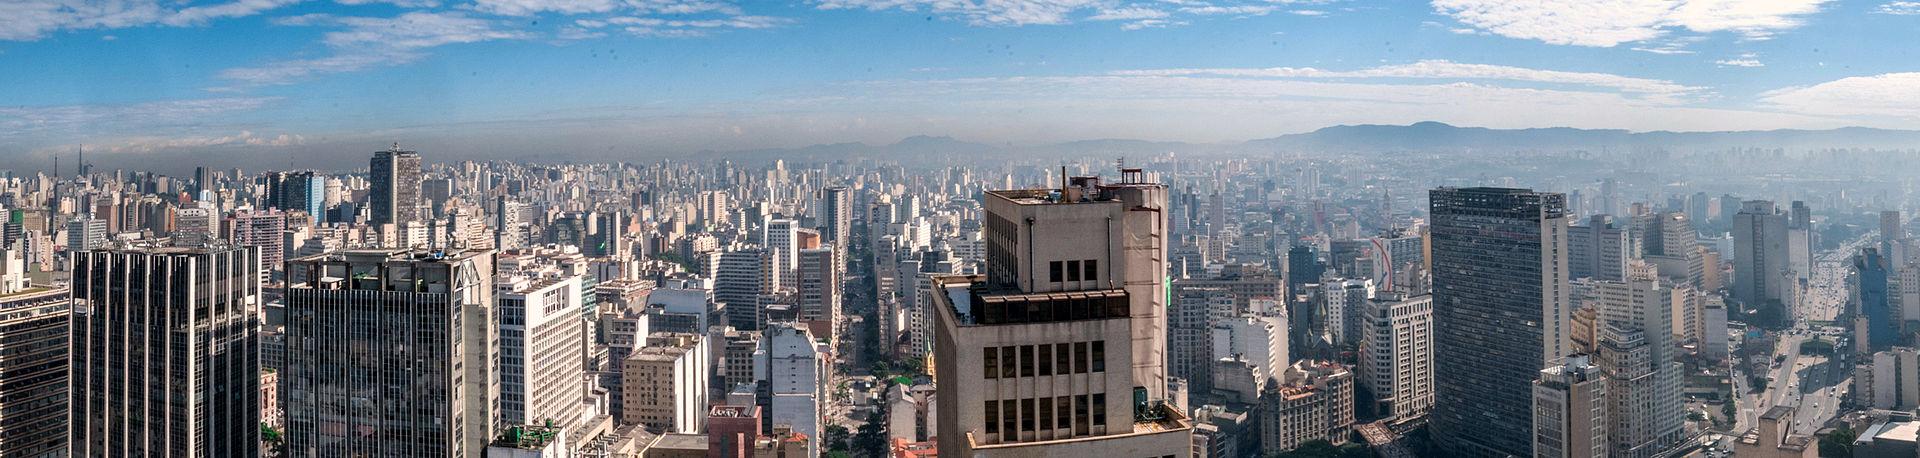 Sao Paulo, en.wikipedia.org